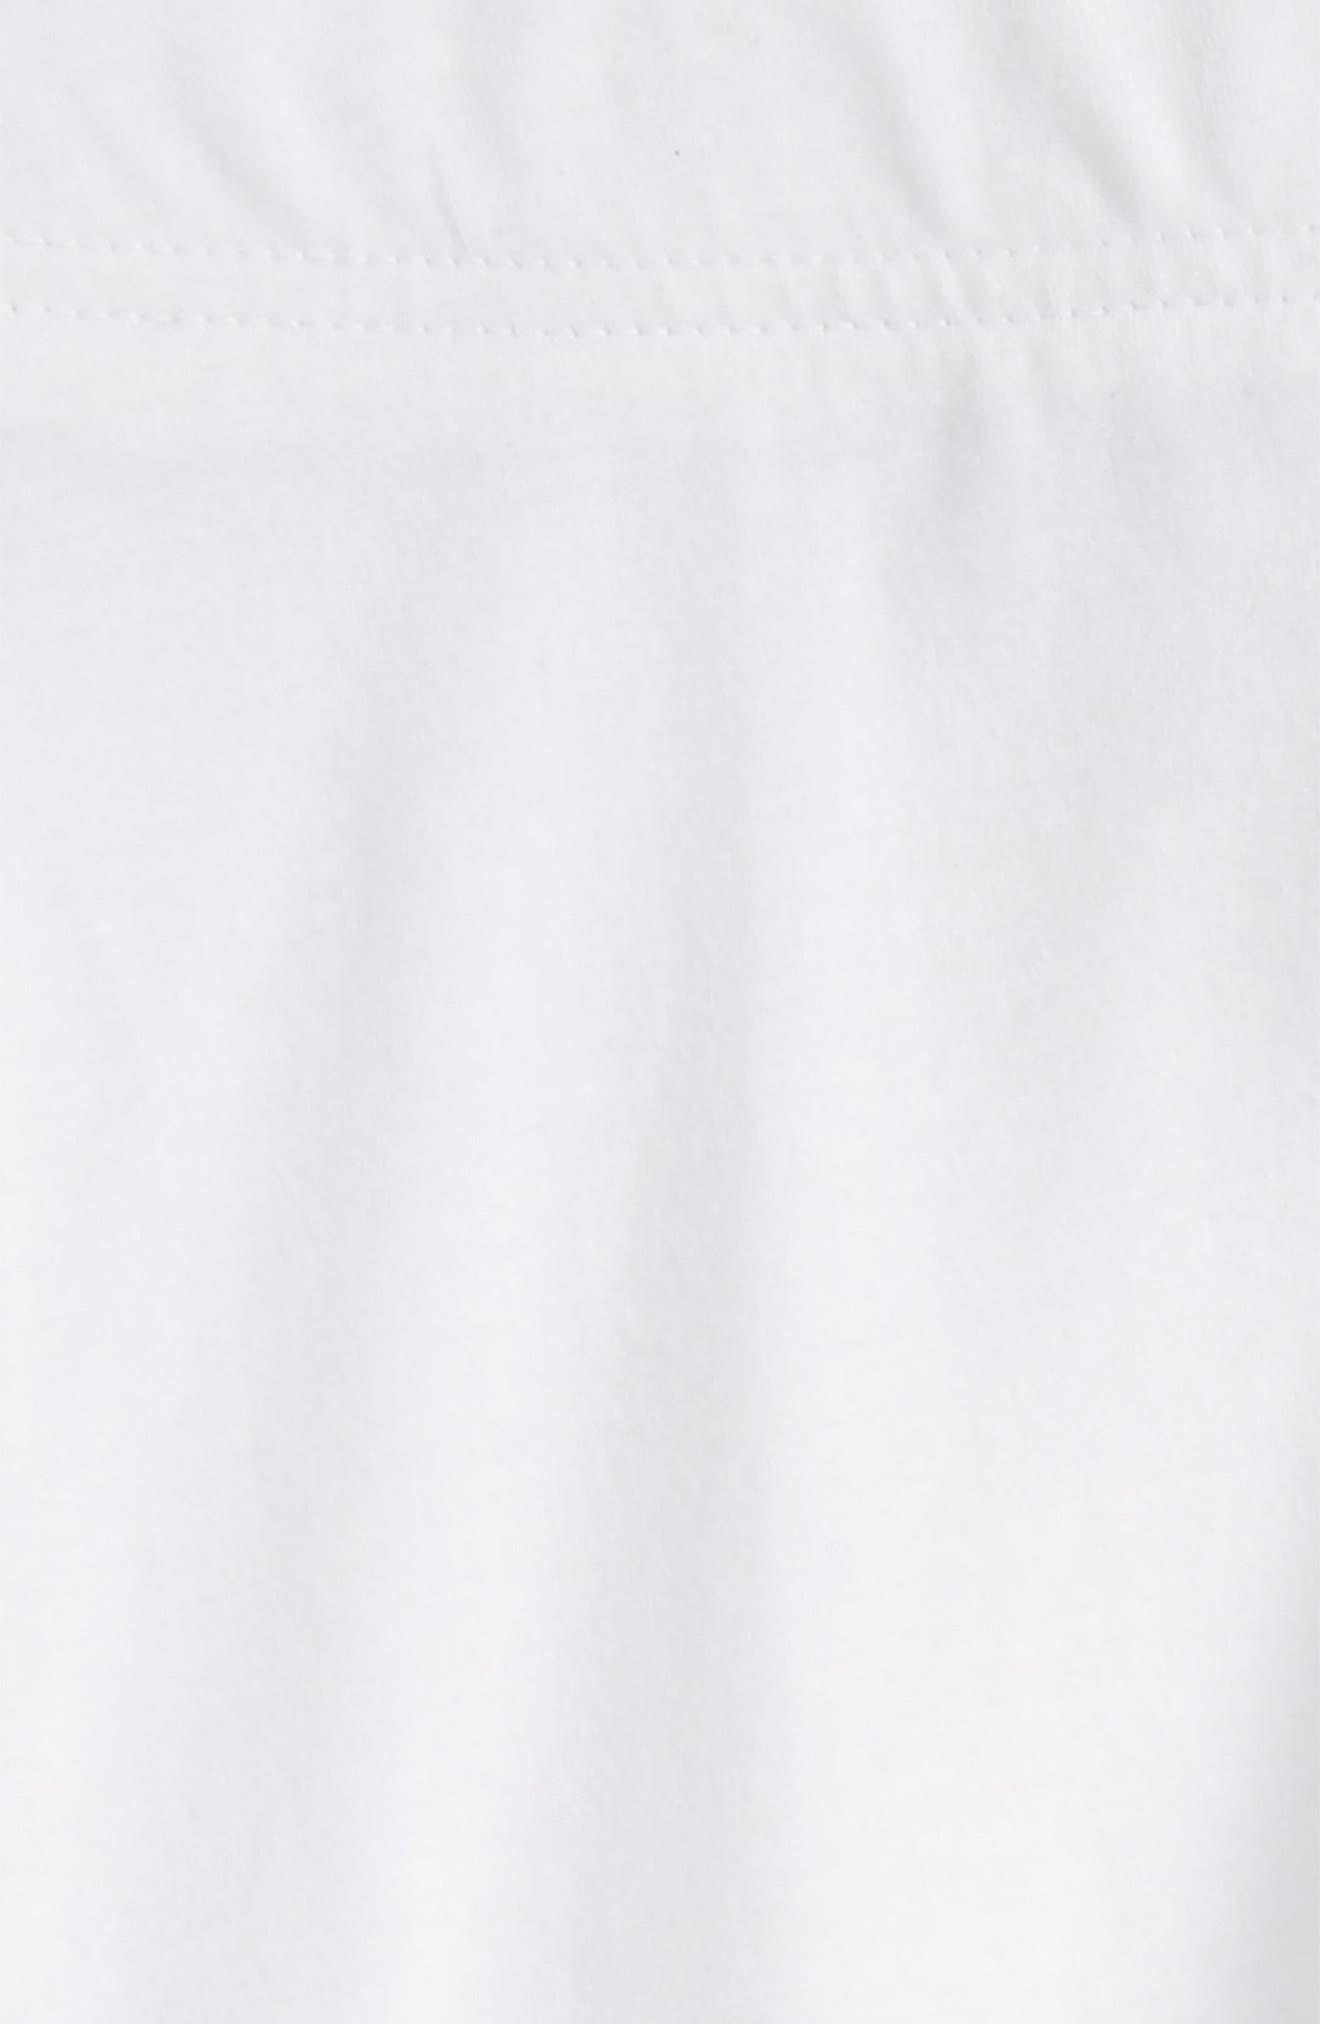 Girls Tucker  Tate Core Leggings Size 6  White